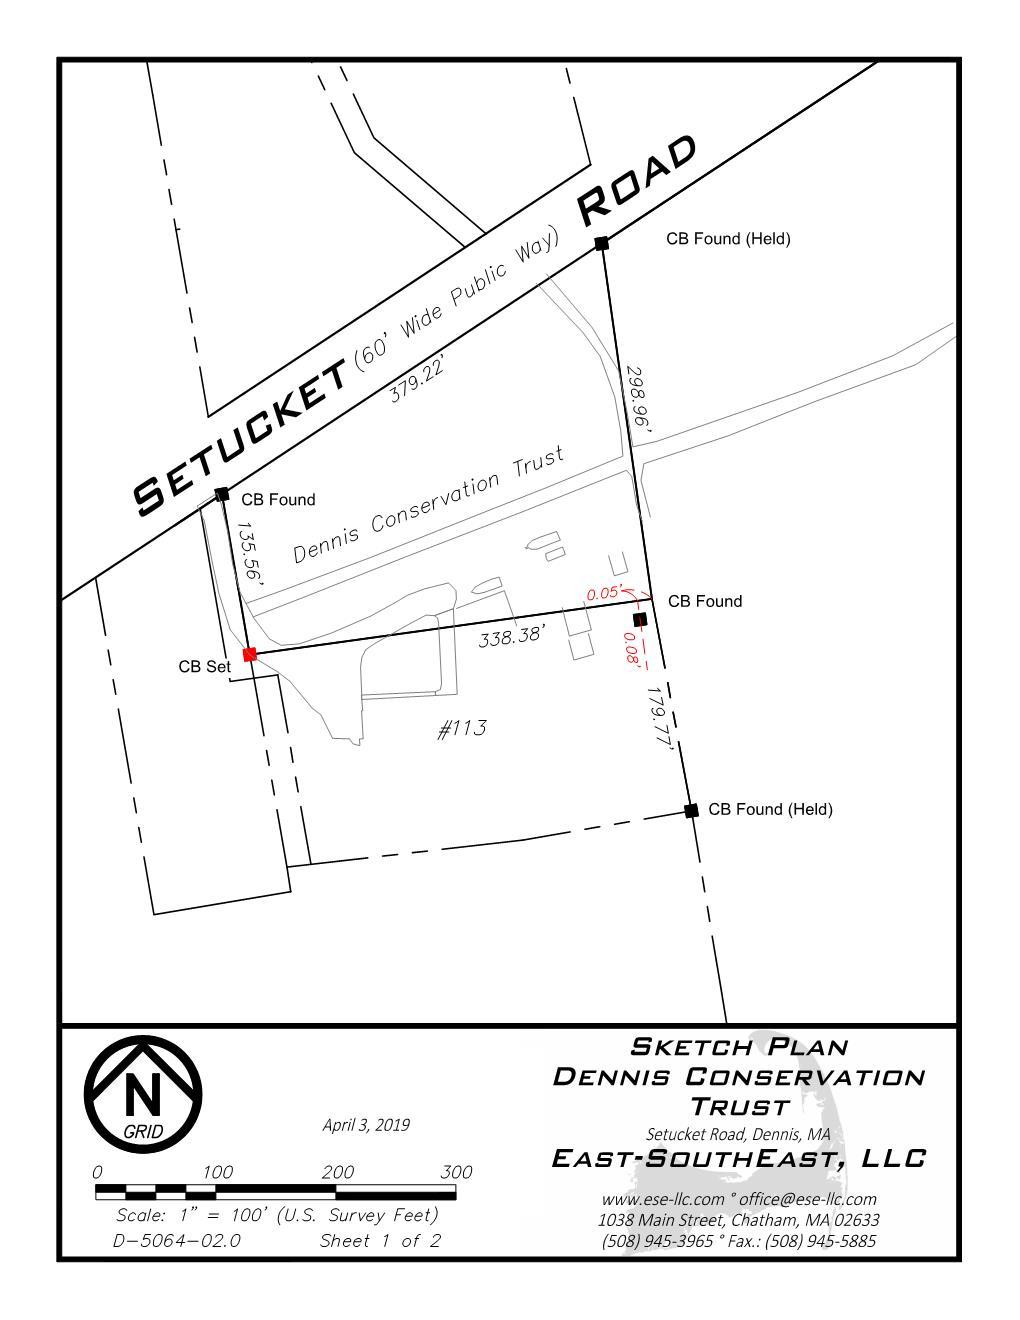 2019-04-02 DCT 121 Setucket Road Sketch Plan Page 001.jpg